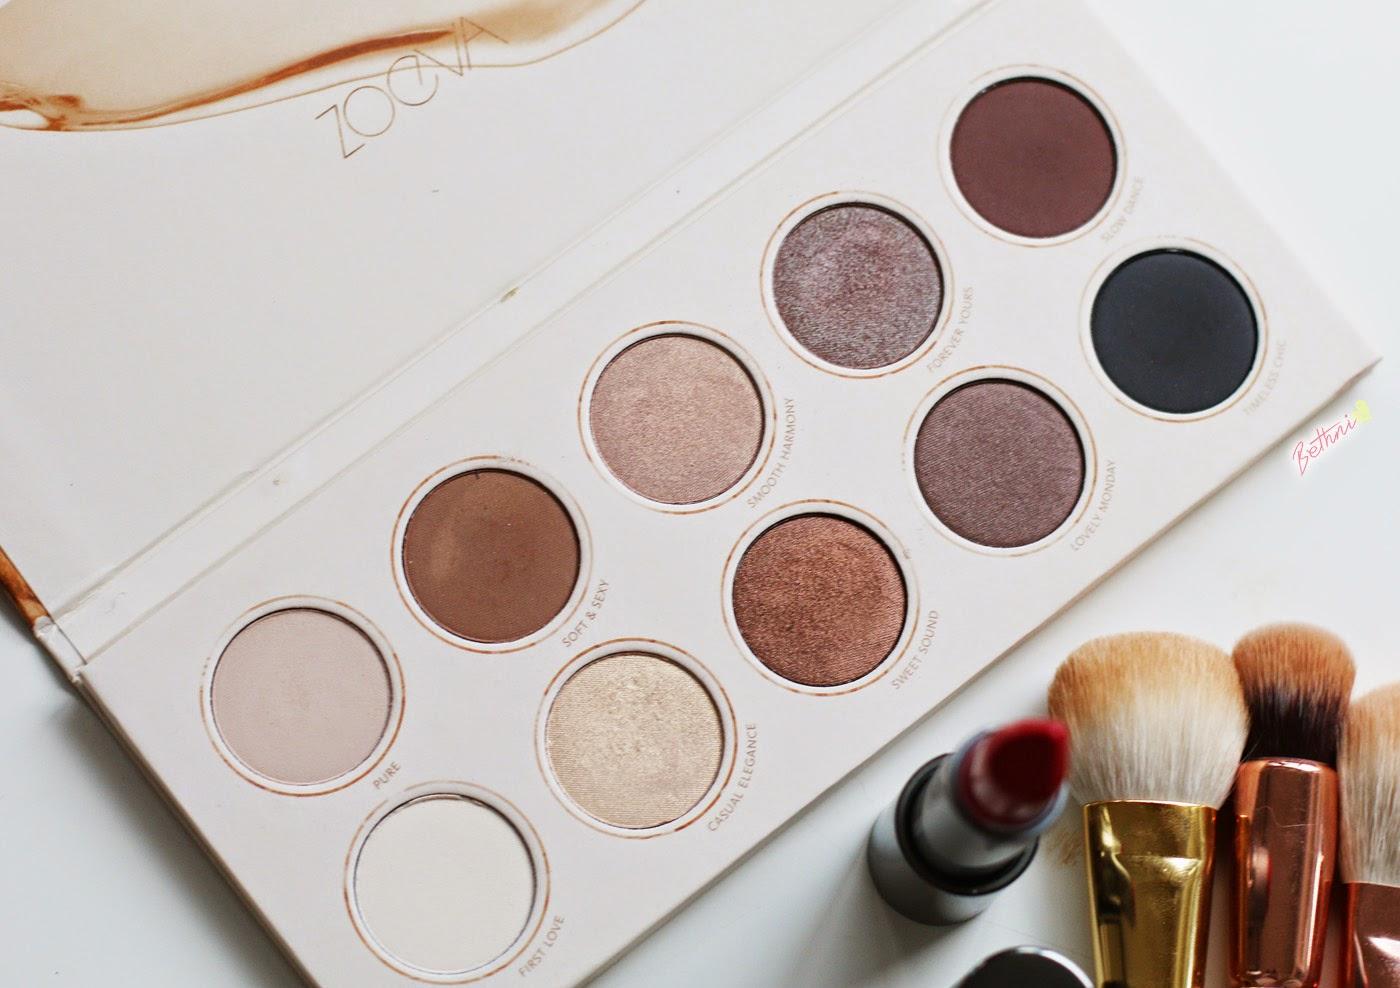 Zoeva Naturally Yours Eyeshadow Palette